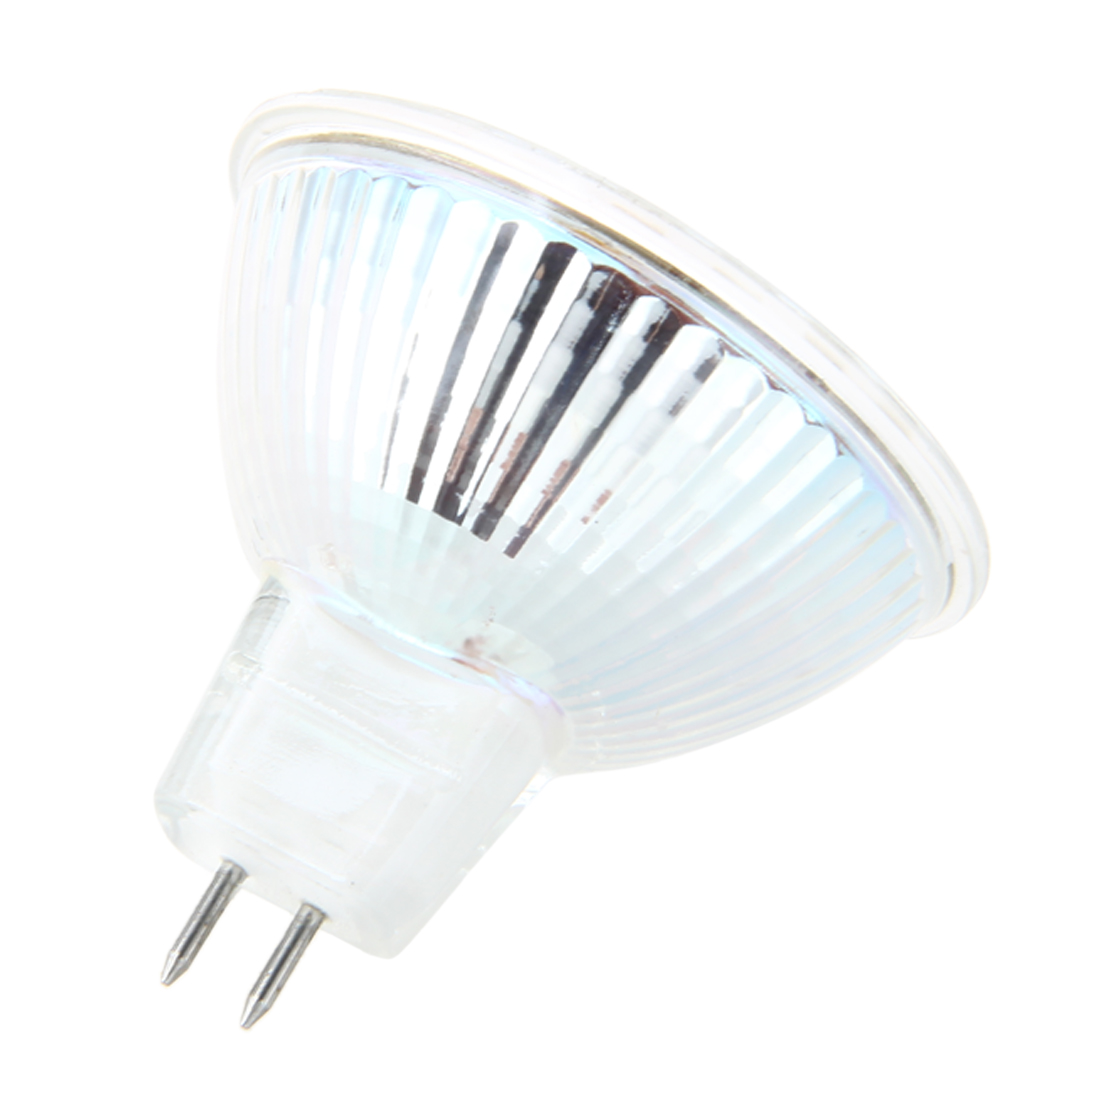 Ecloud ShopUS 10 pieces 10 MR16 GU5.3 60 3528 SMD LED High Power Warm White Spot Light Bulb Lamp 4W